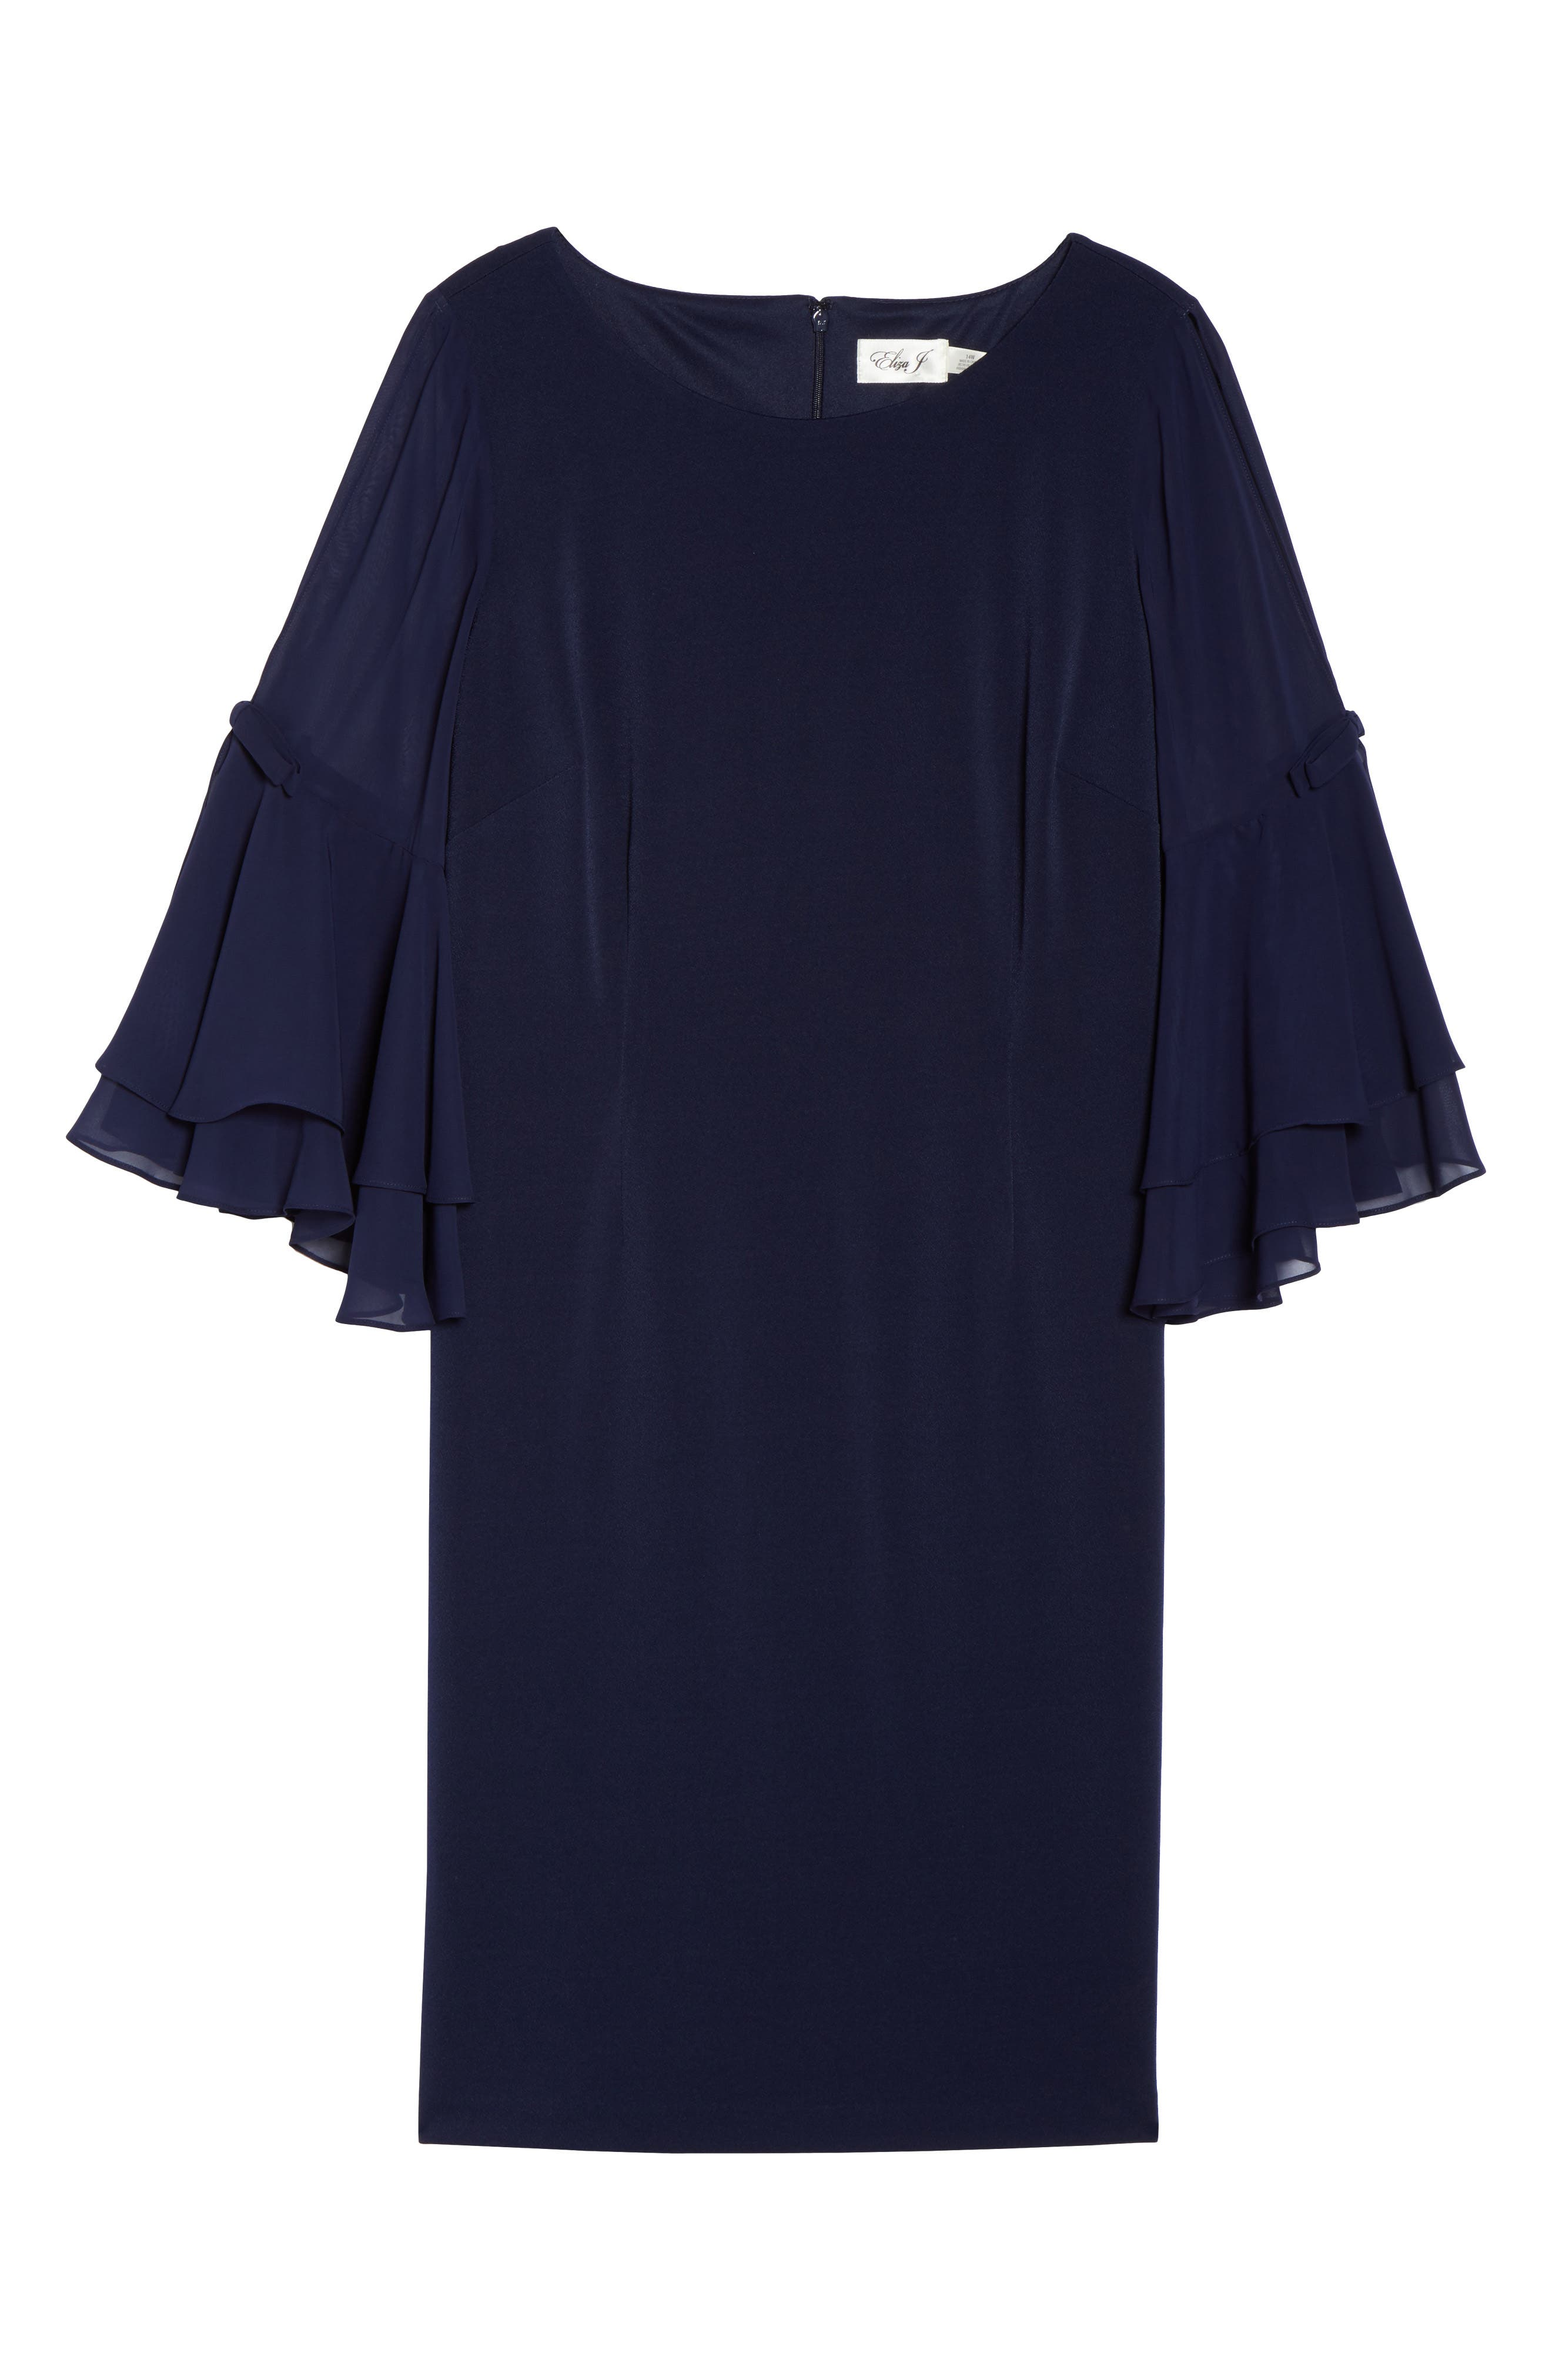 Bow Sleeve Chiffon Shift Dress,                             Alternate thumbnail 6, color,                             Navy